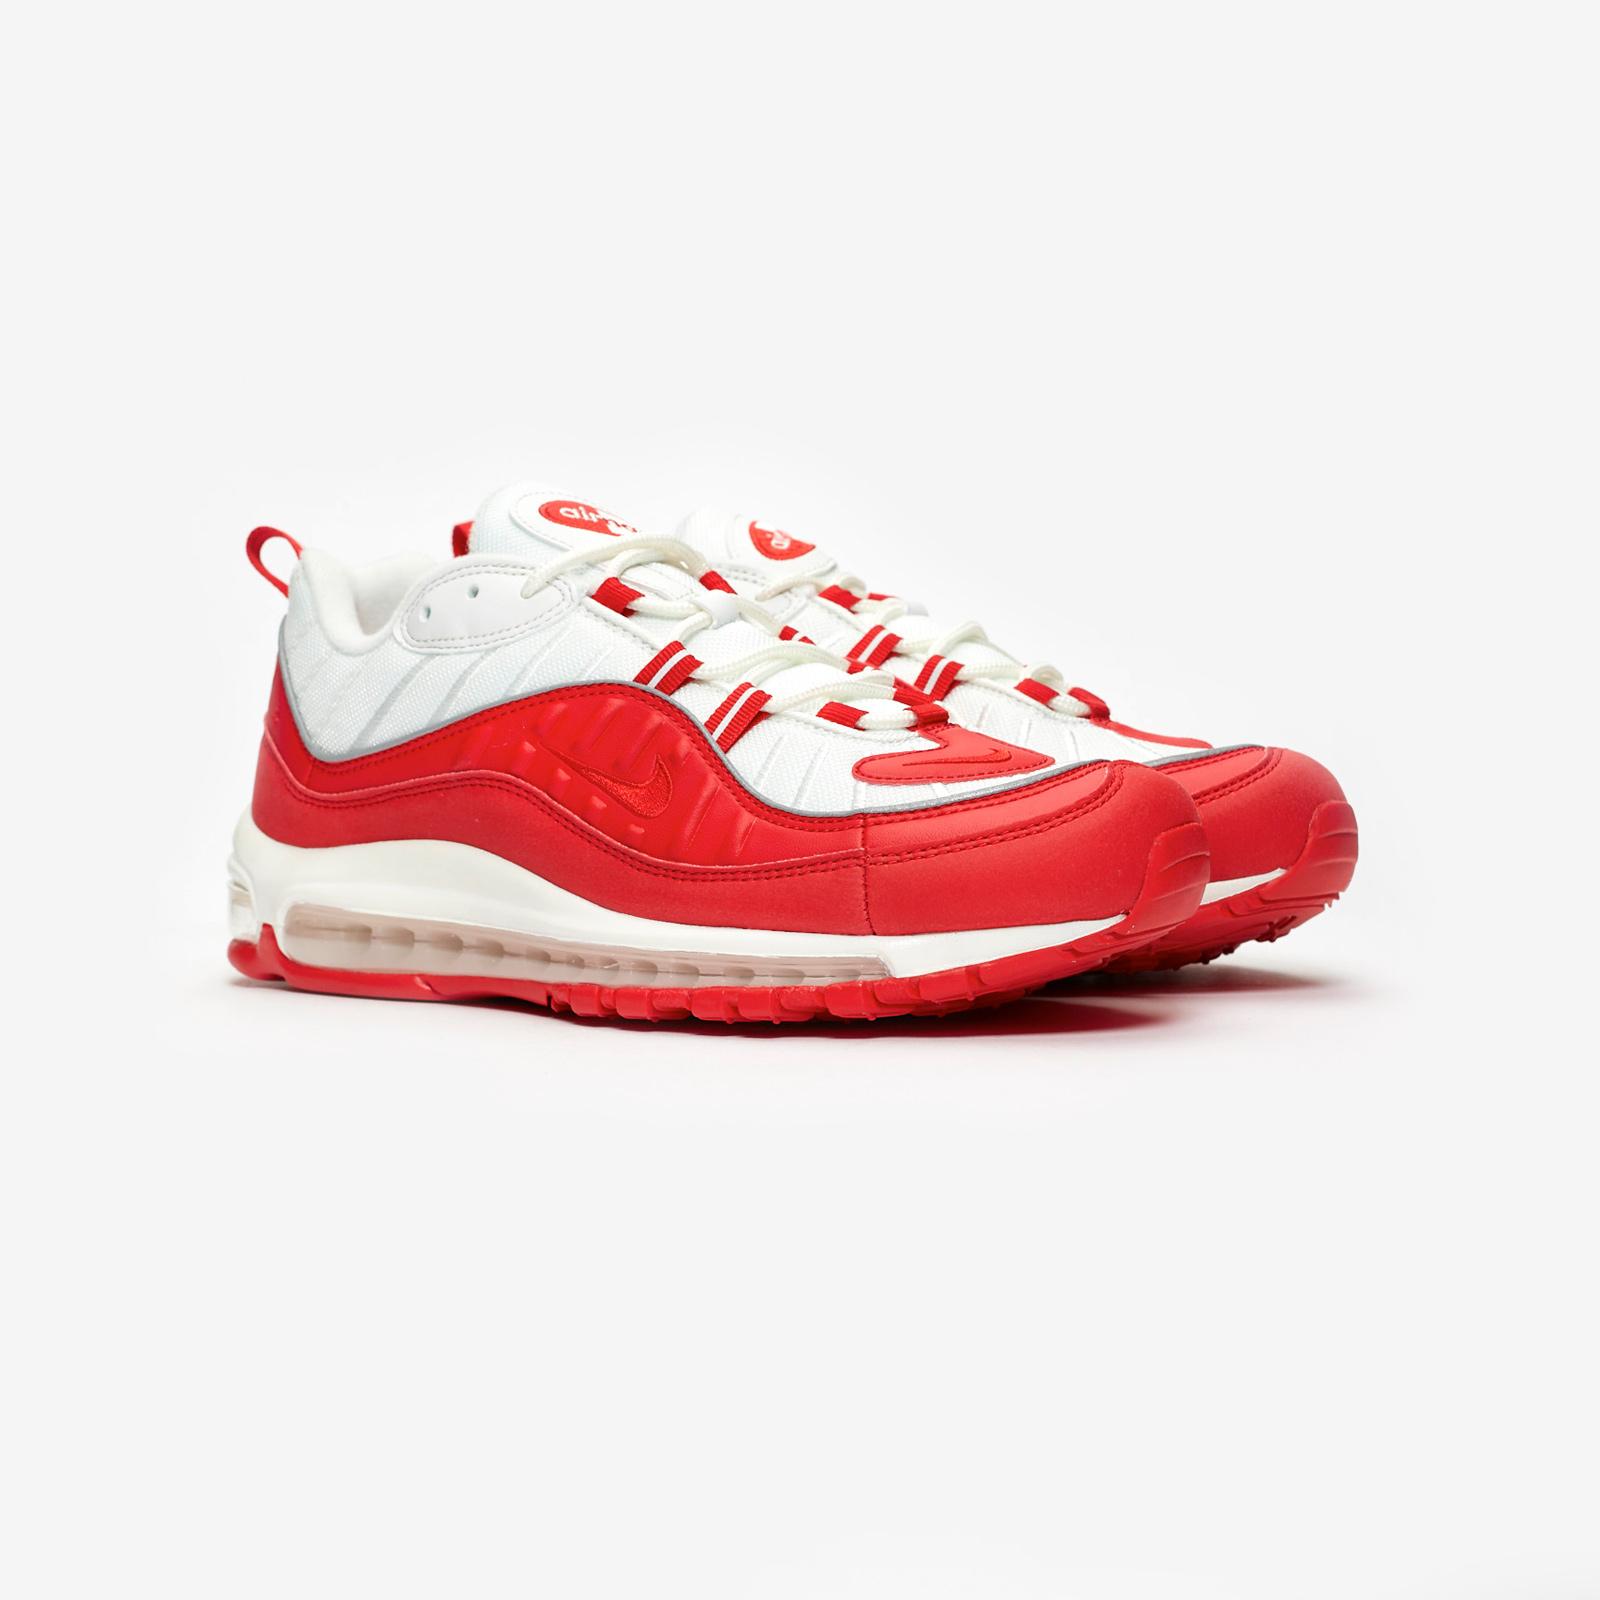 9d608de8 Nike Air Max 98 - 640744-602 - Sneakersnstuff | sneakers ...